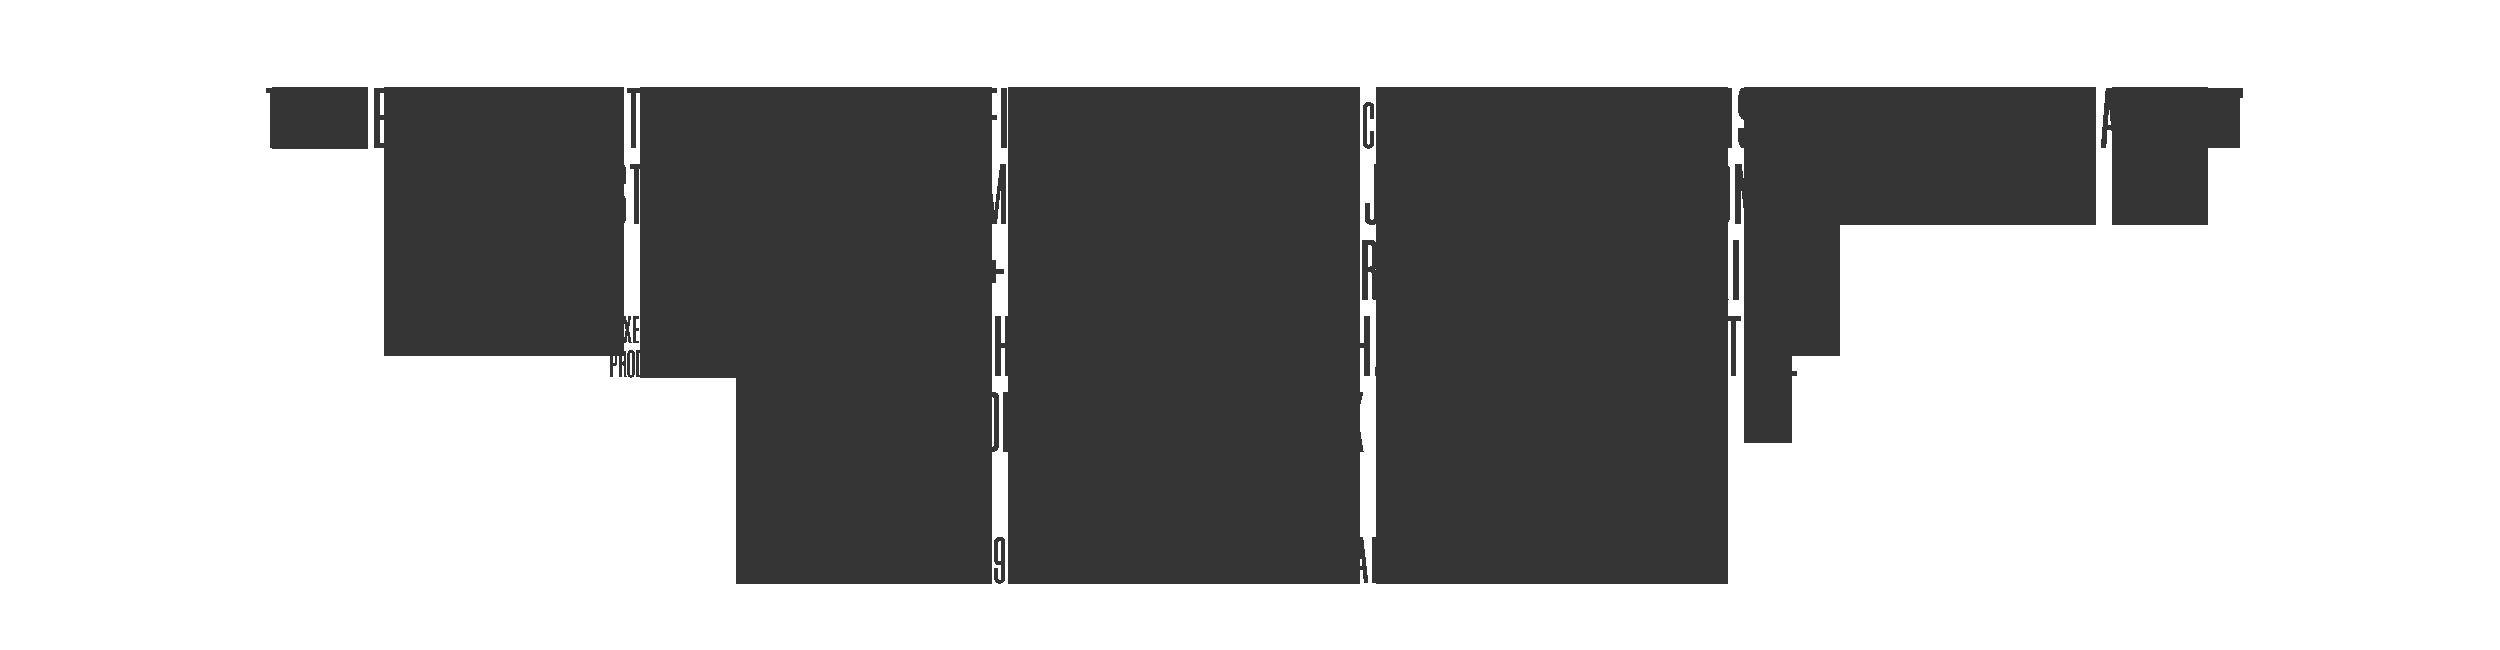 Billing Block_TCTSA_1.25.19_final_for website_grey.png